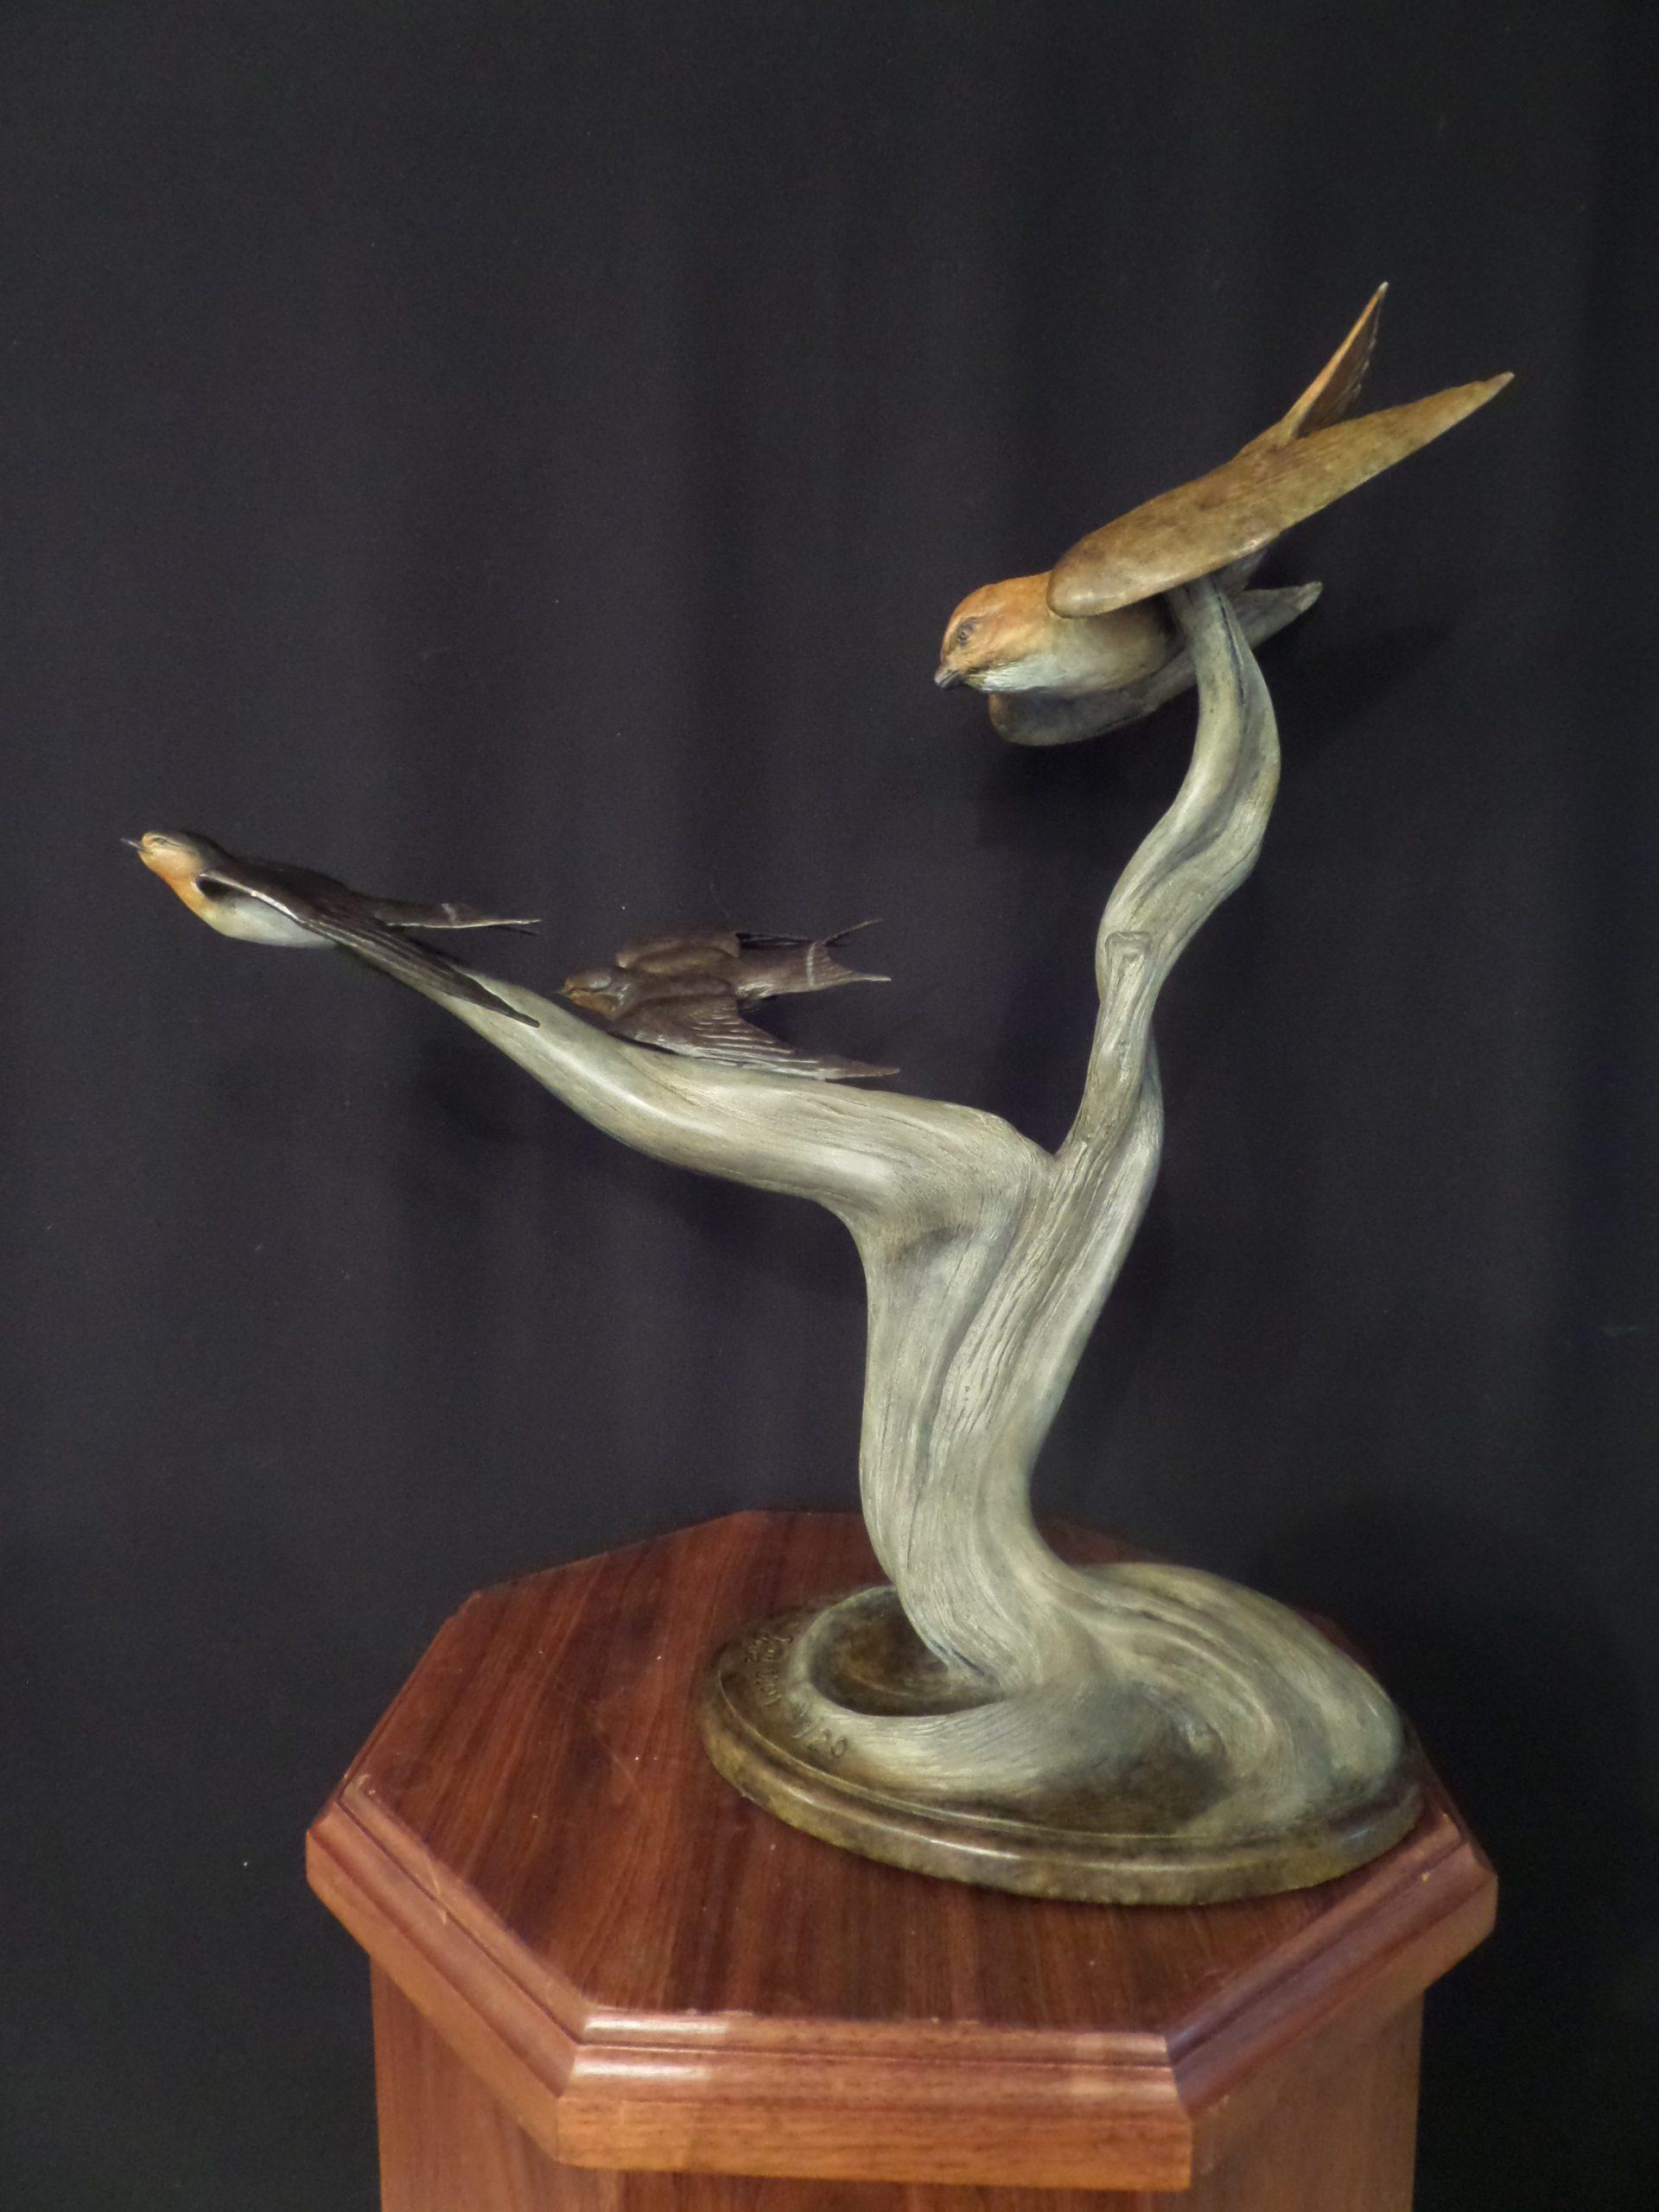 """Barnyard Ballet"" - Kestral and Swallows by Burl Jones Limited Edition 20 - 21"" Long x 21"" Tall"